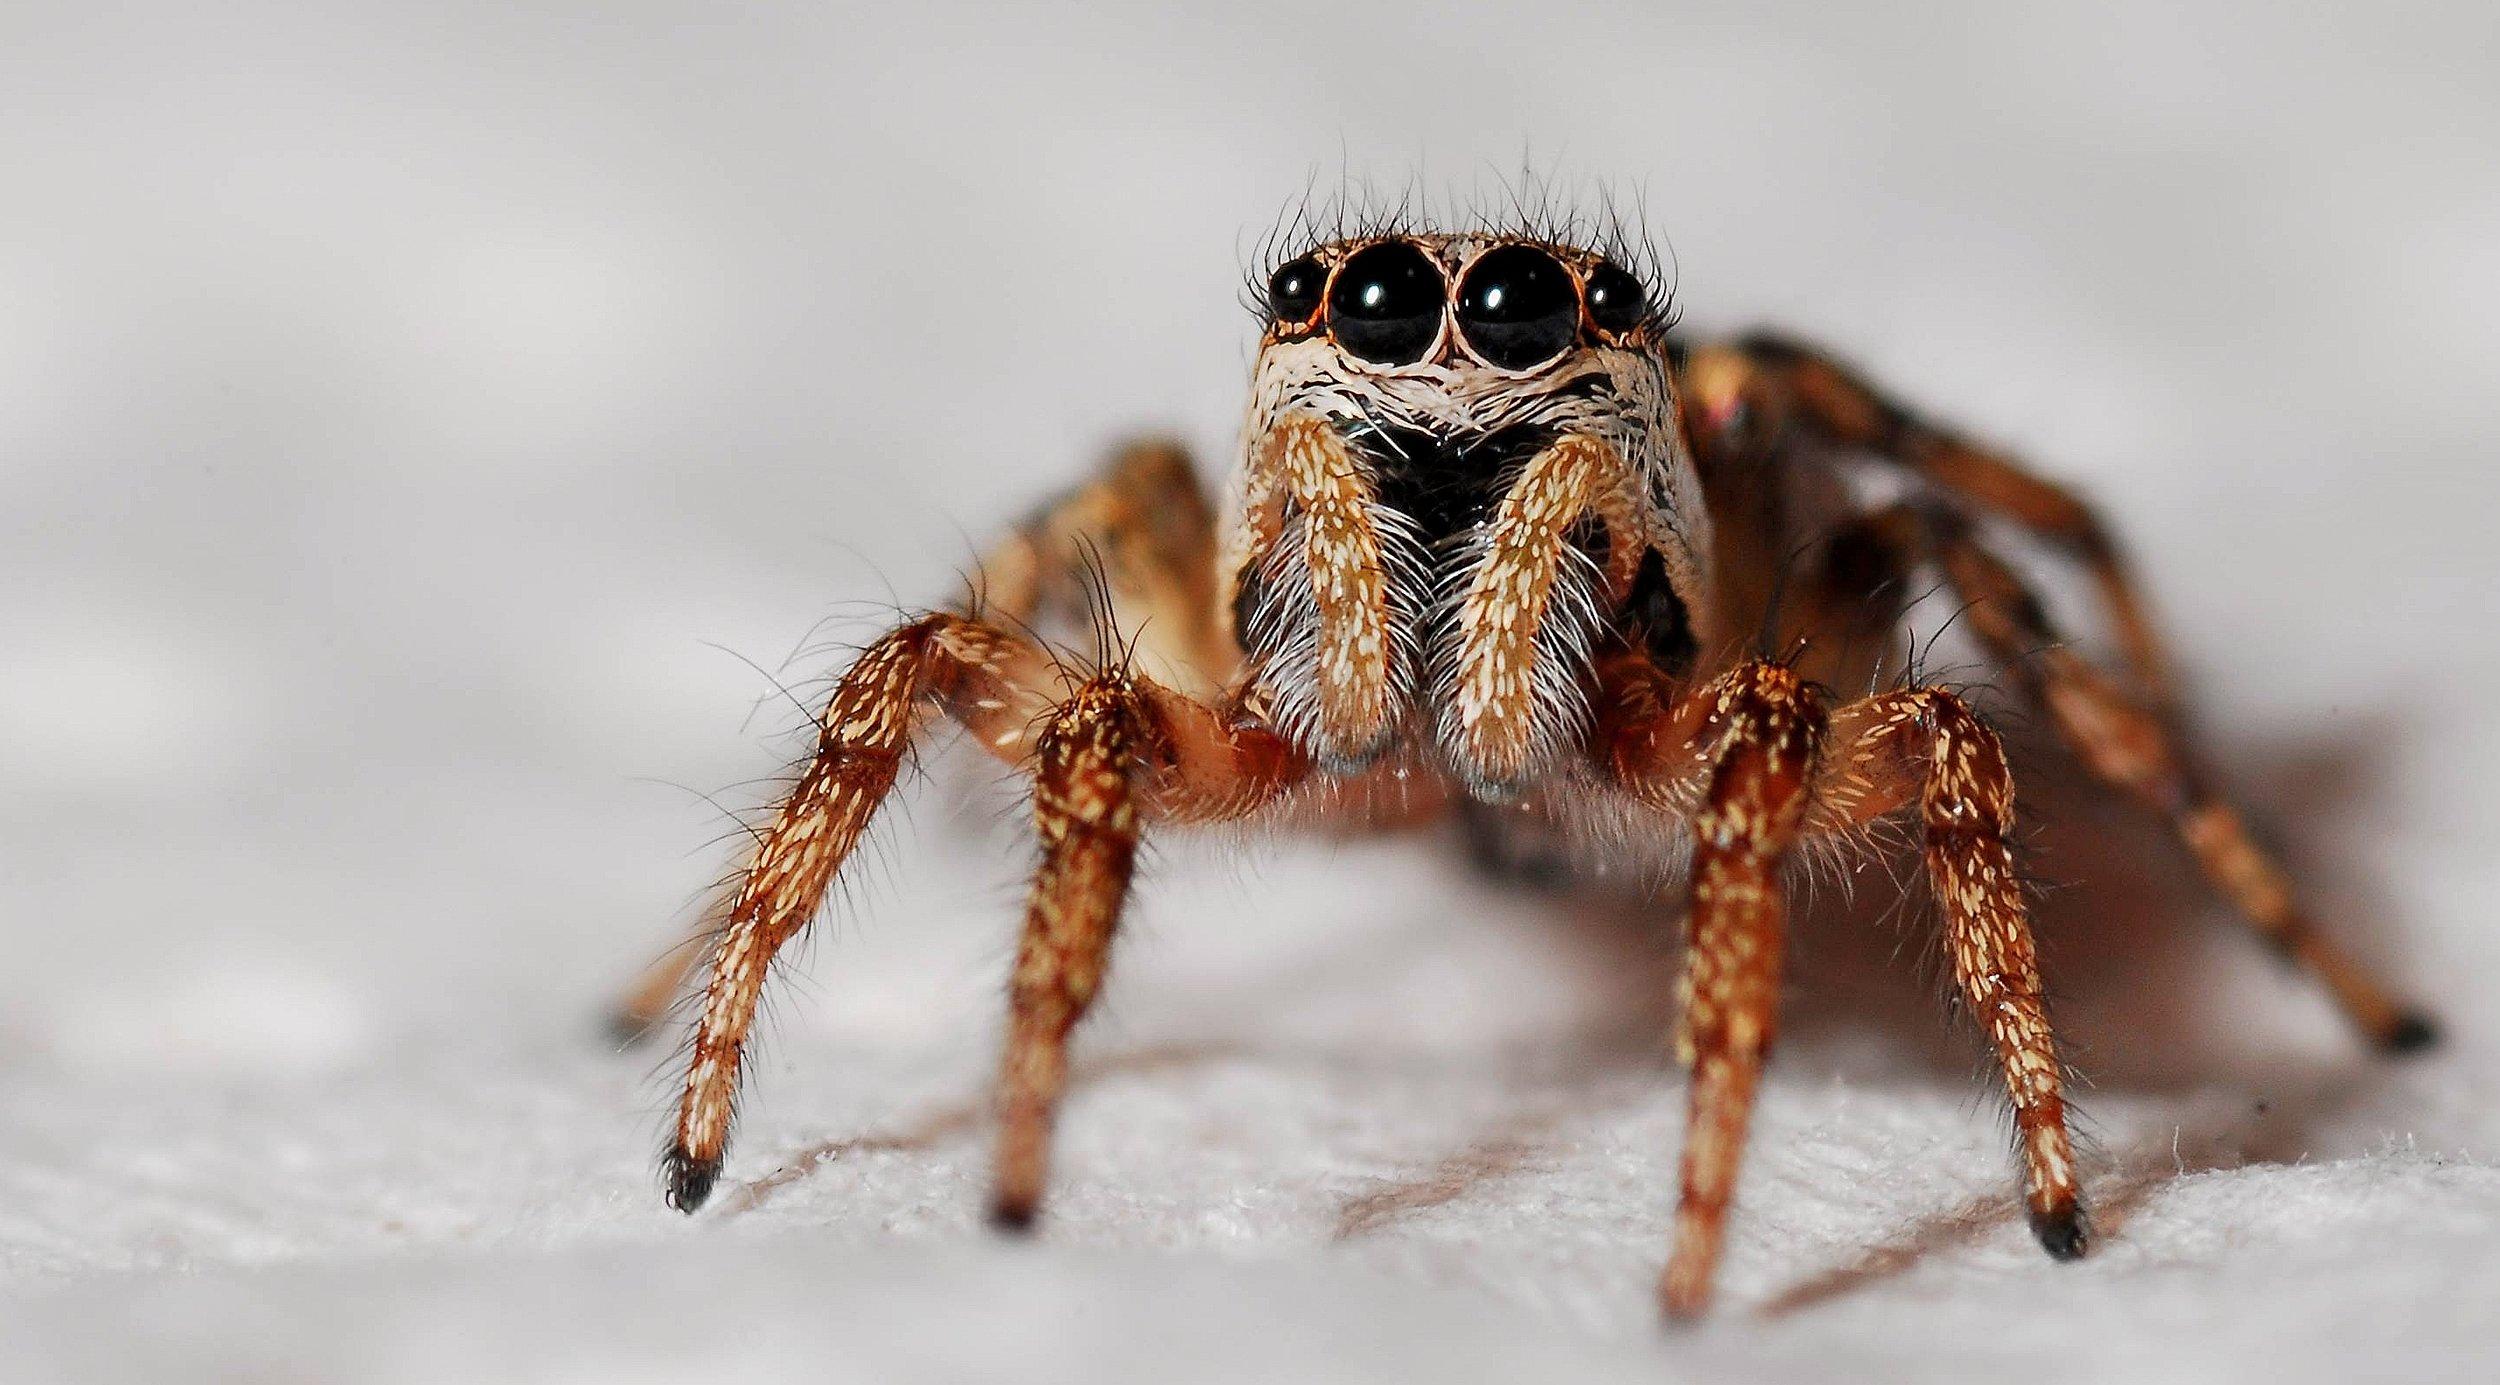 spider-macro-zebra-spider-insect-40795.jpeg